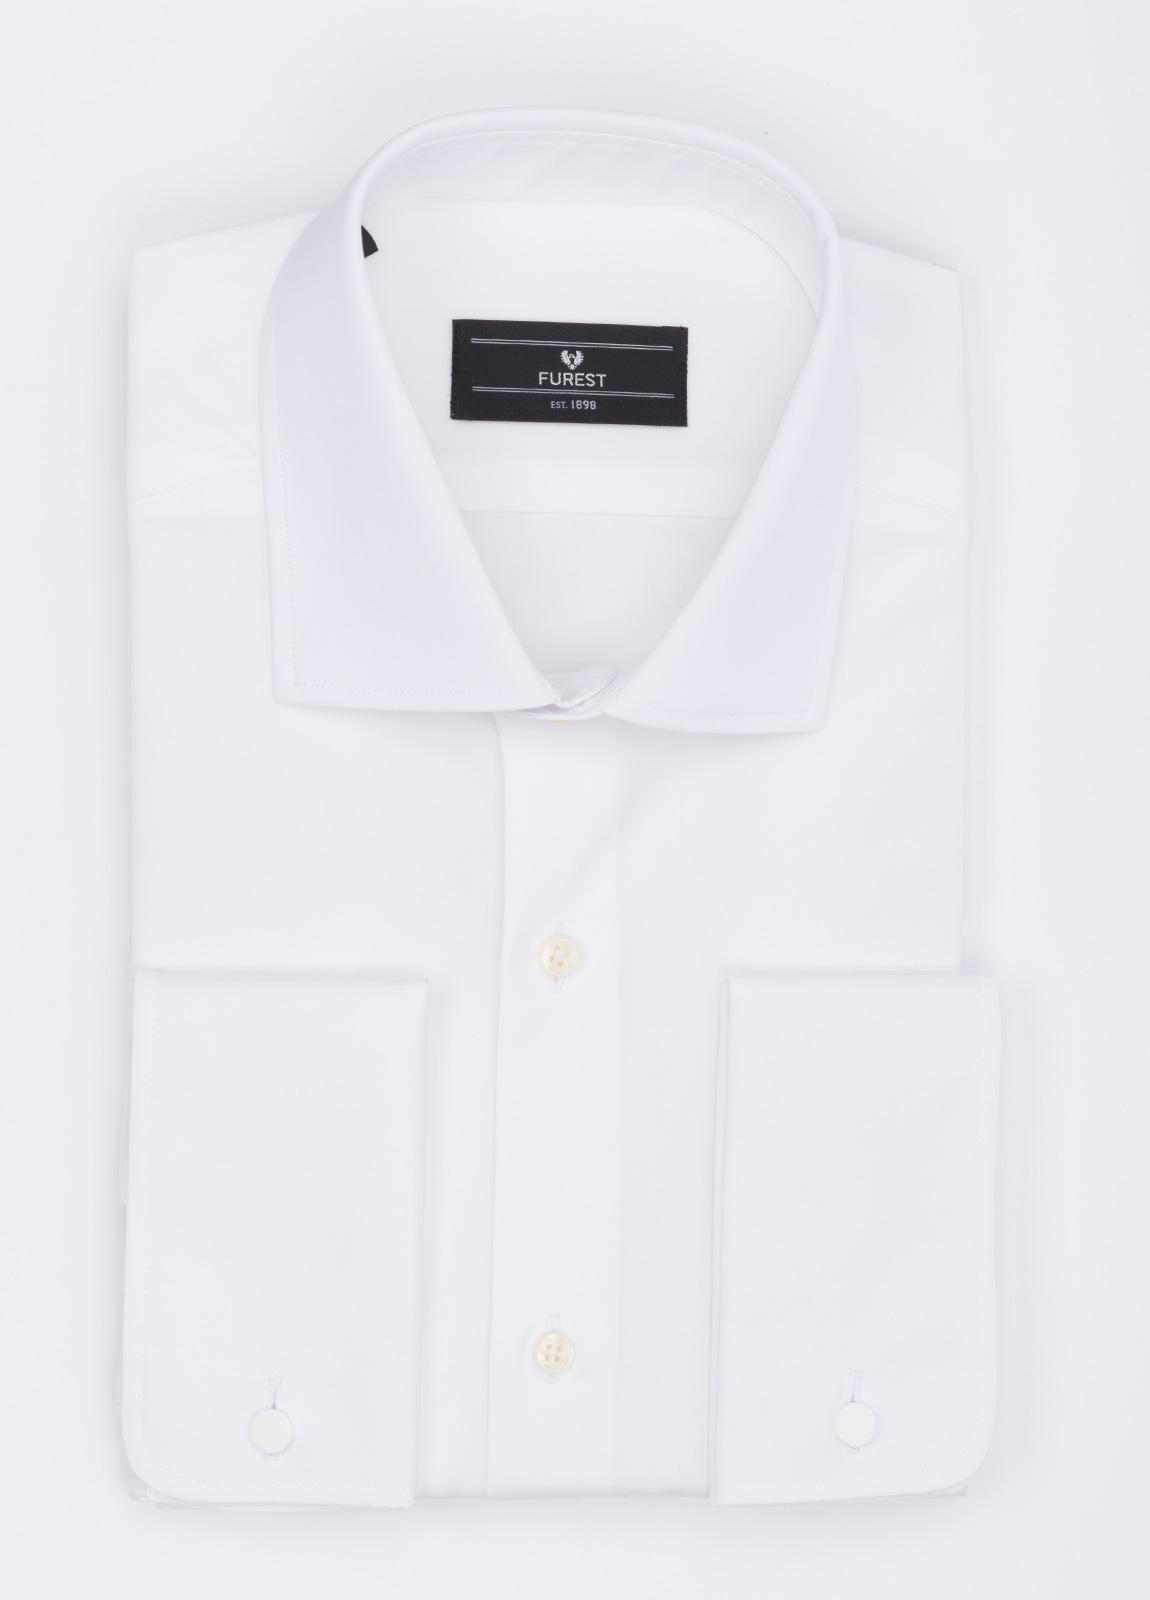 Camisa formal wear slim fit cuello italiano modelo tailored napoli. puño doble, diseño liso color blanco. 100% algodón